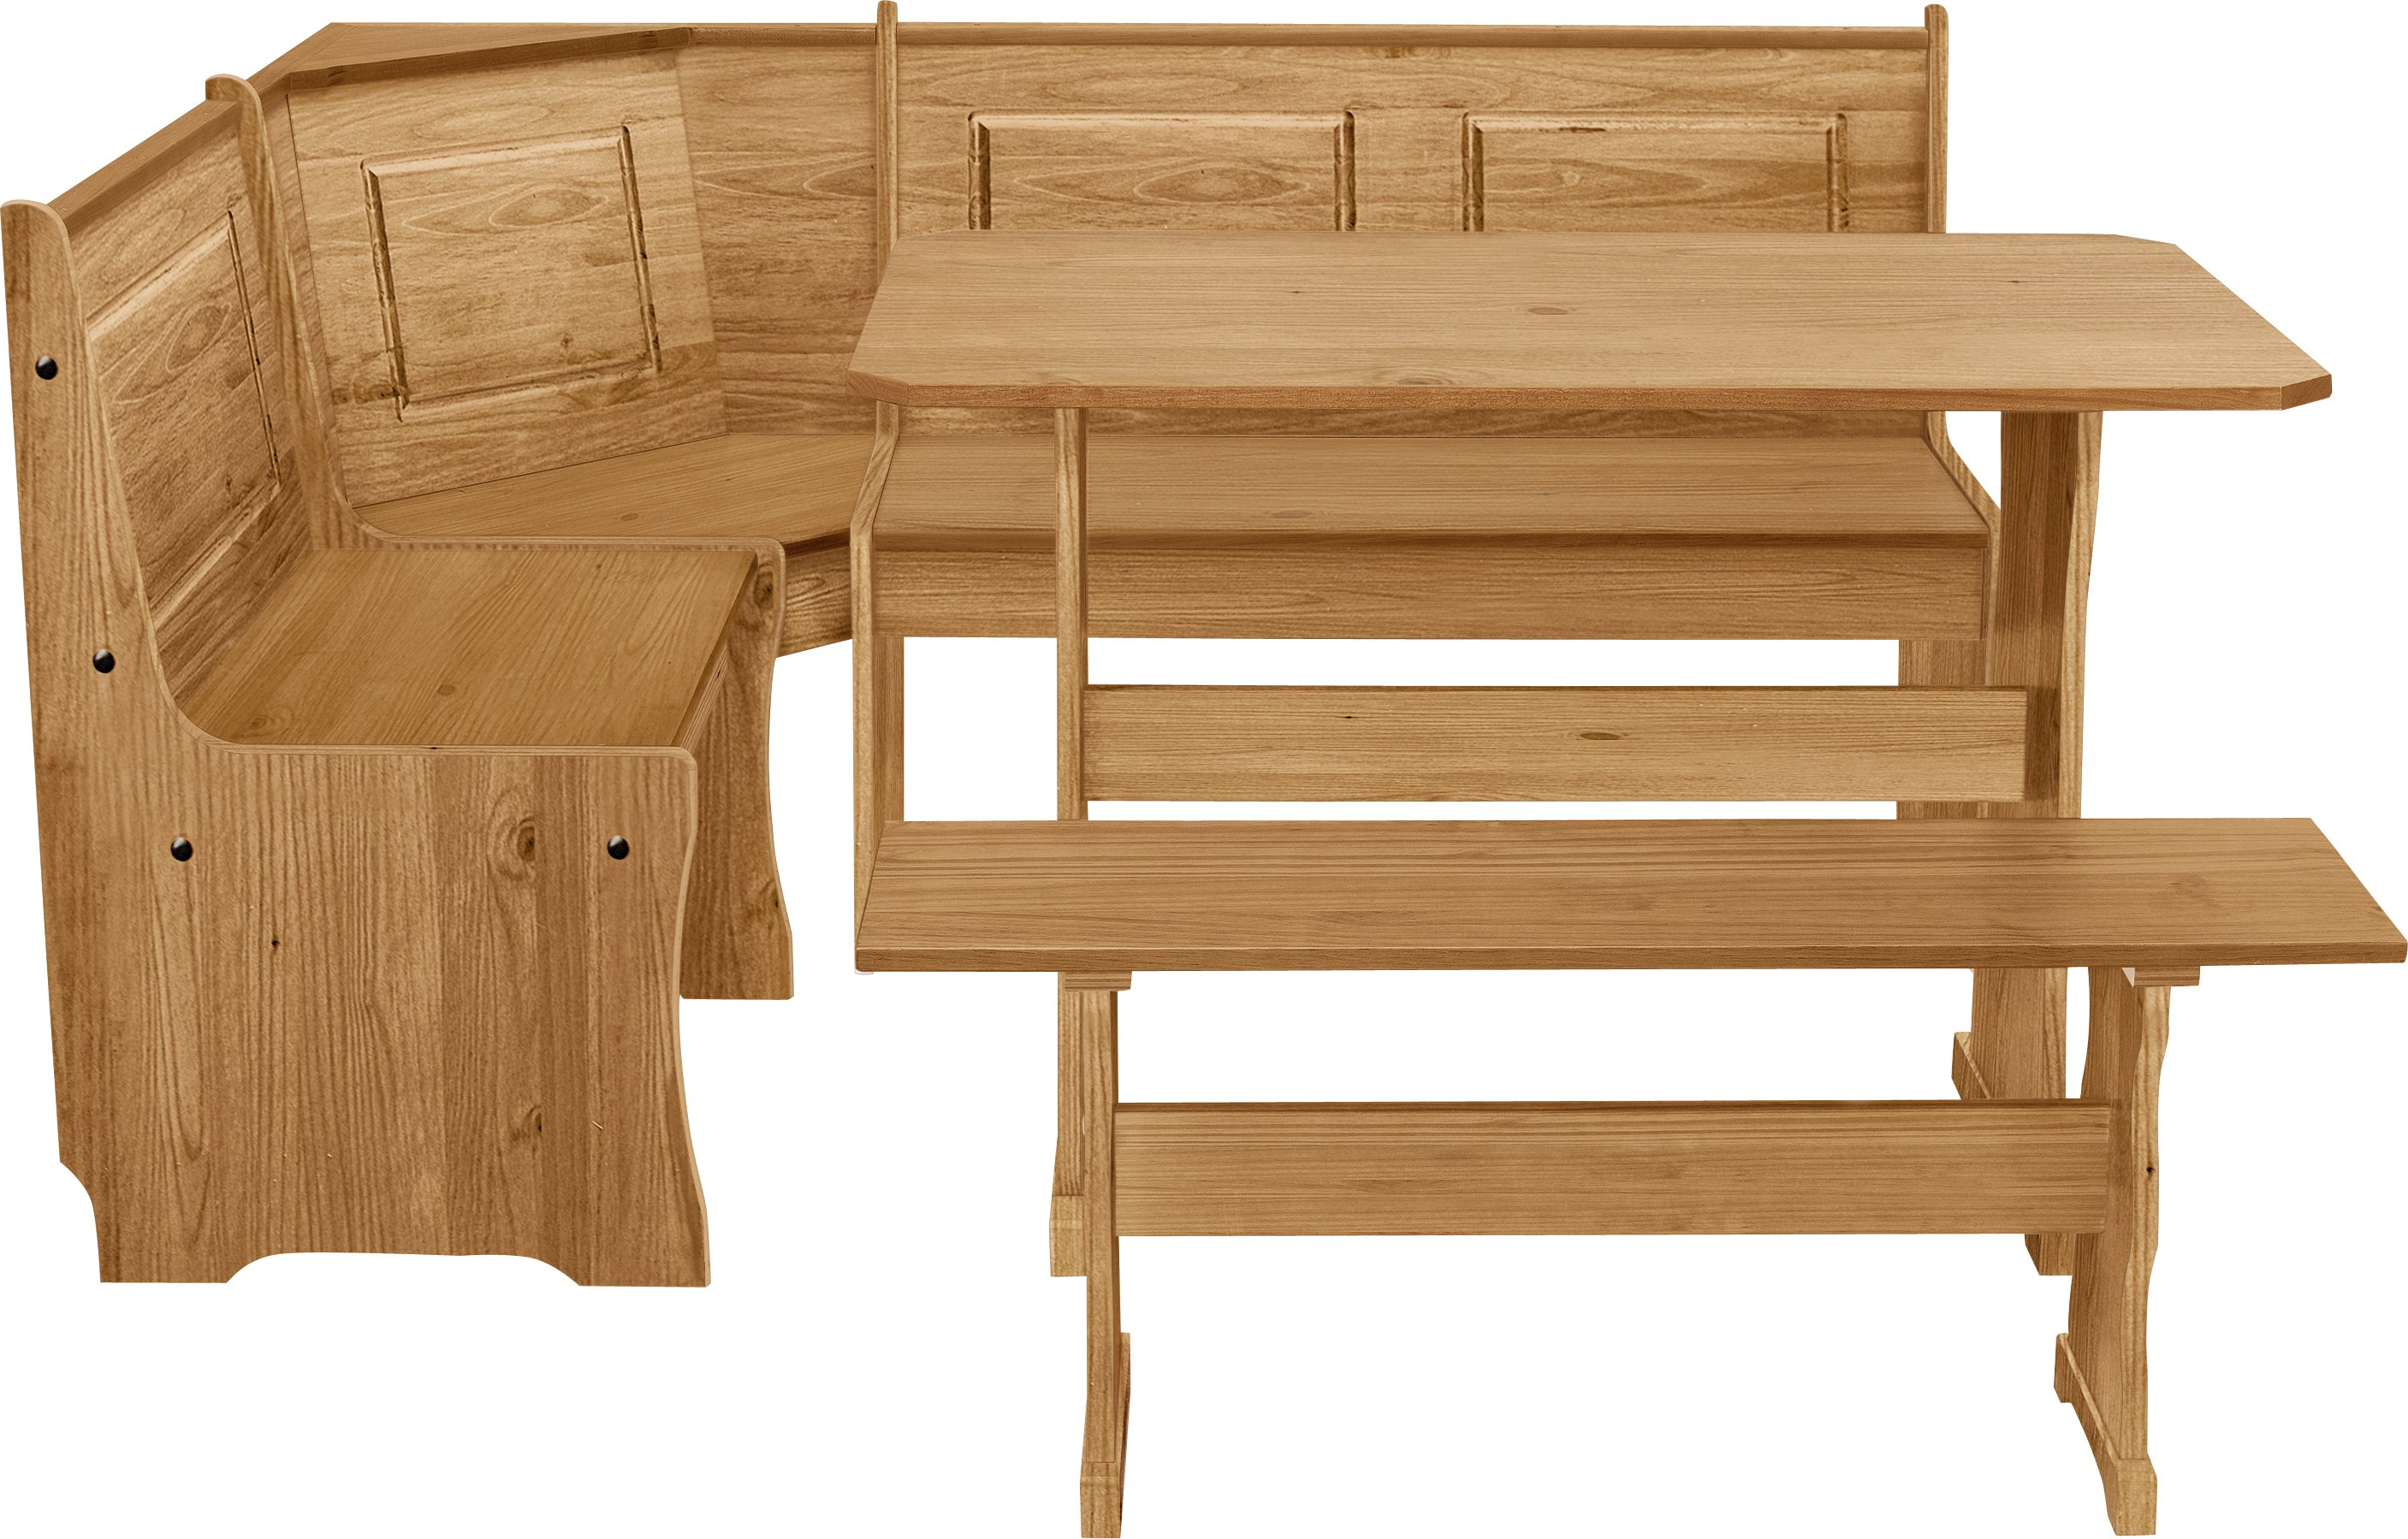 wooden kitchen chairs argos desk amazon home puerto rico nook table 3 corner bench set pine